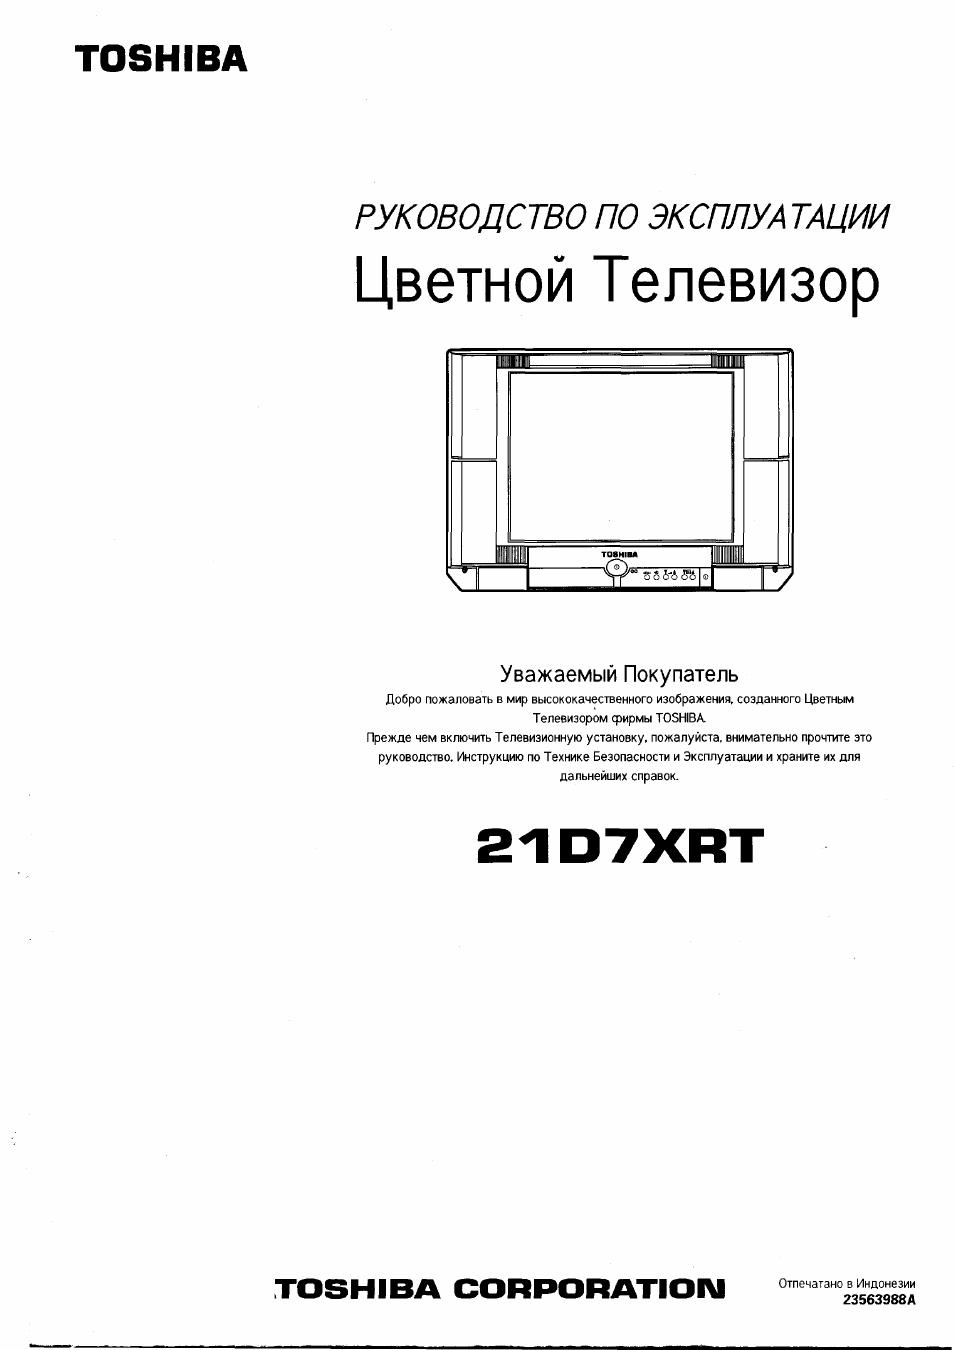 инструкция к телевизору toshiba 21d7xrt